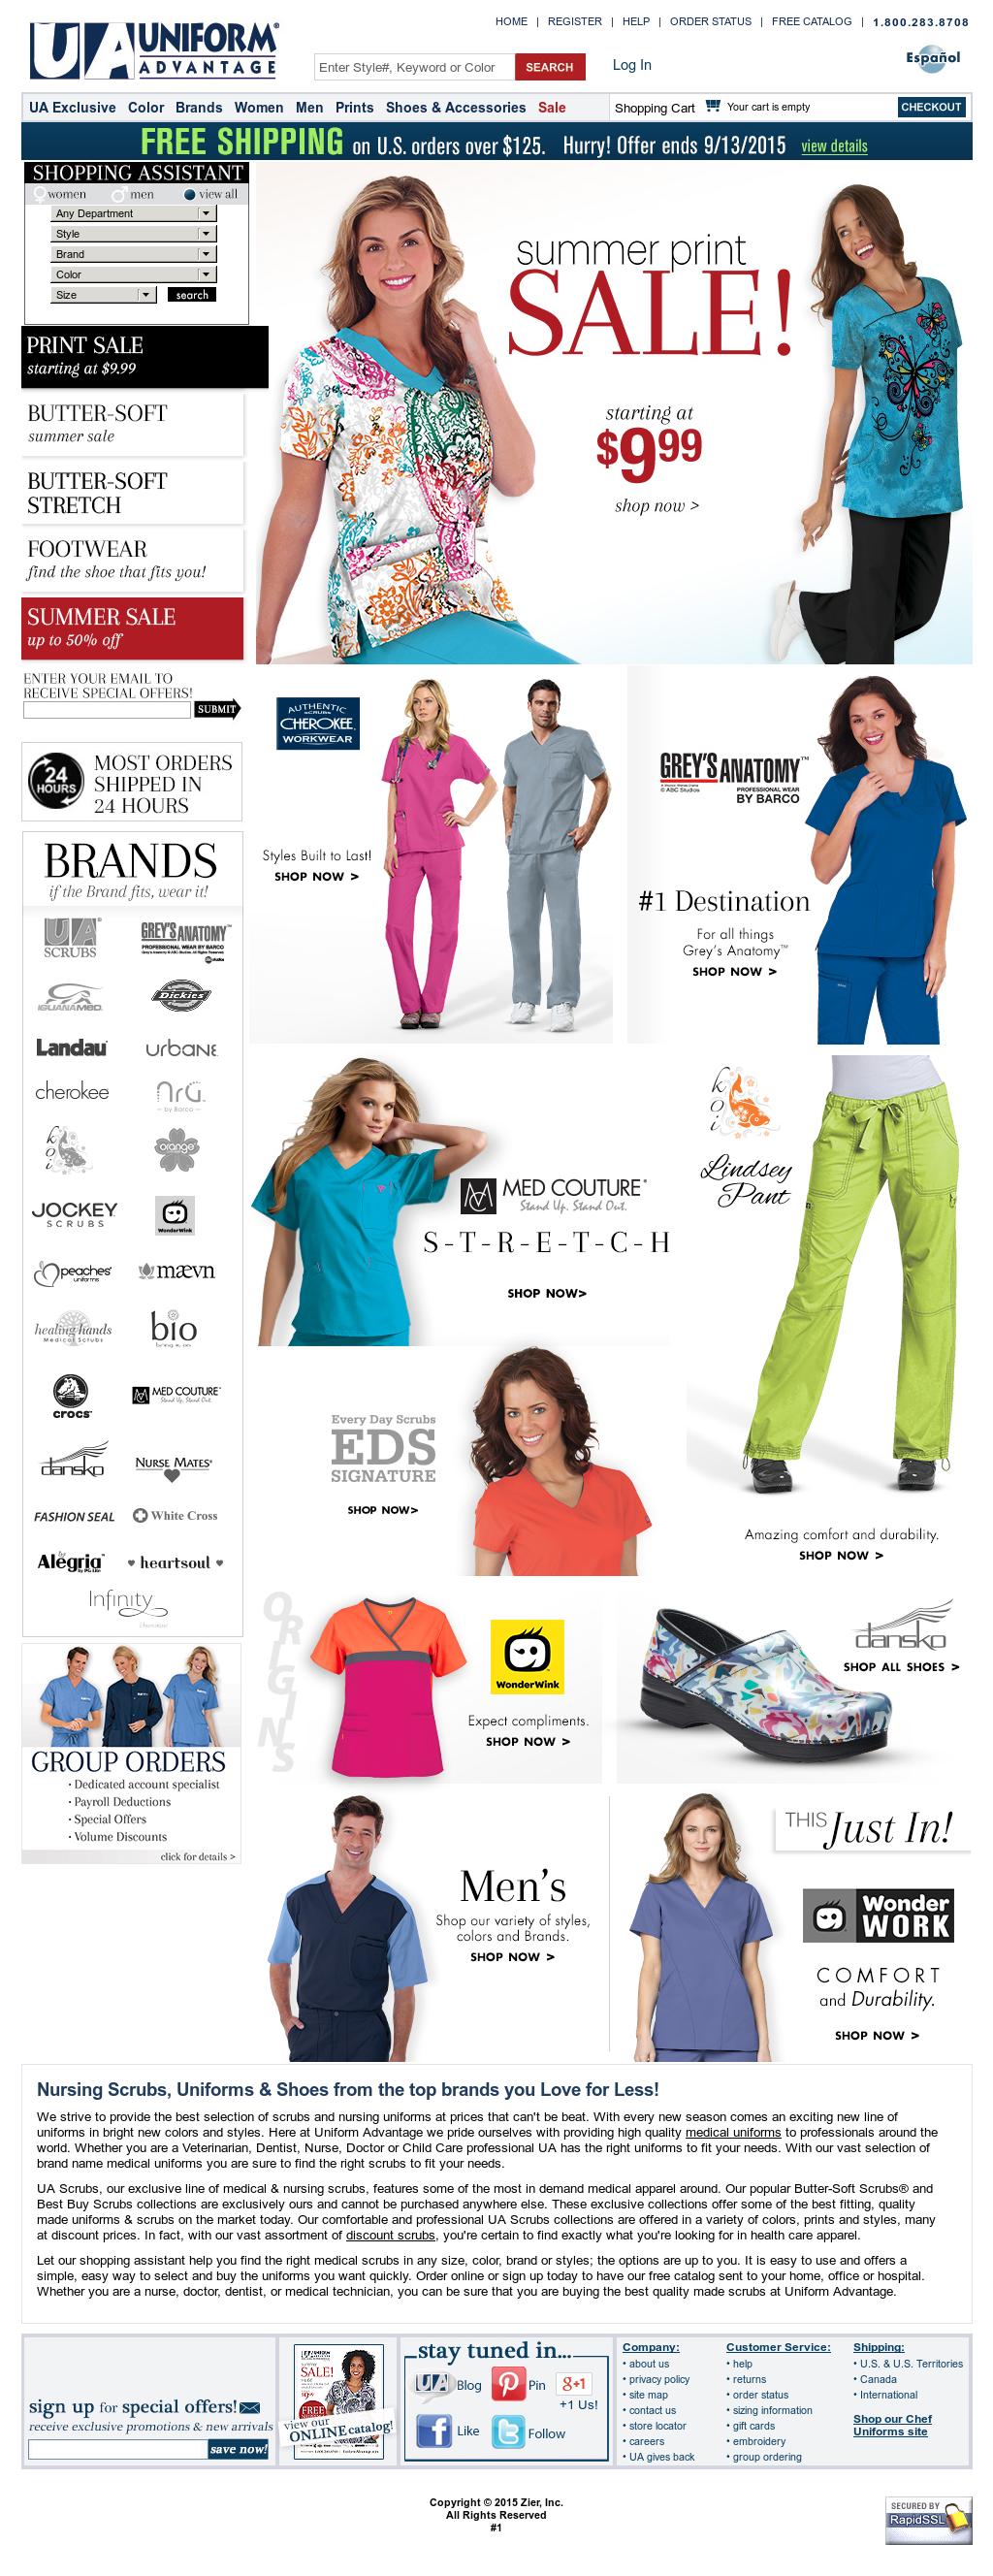 313c59f9974 Uniform Advantage Competitors, Revenue and Employees - Owler Company Profile